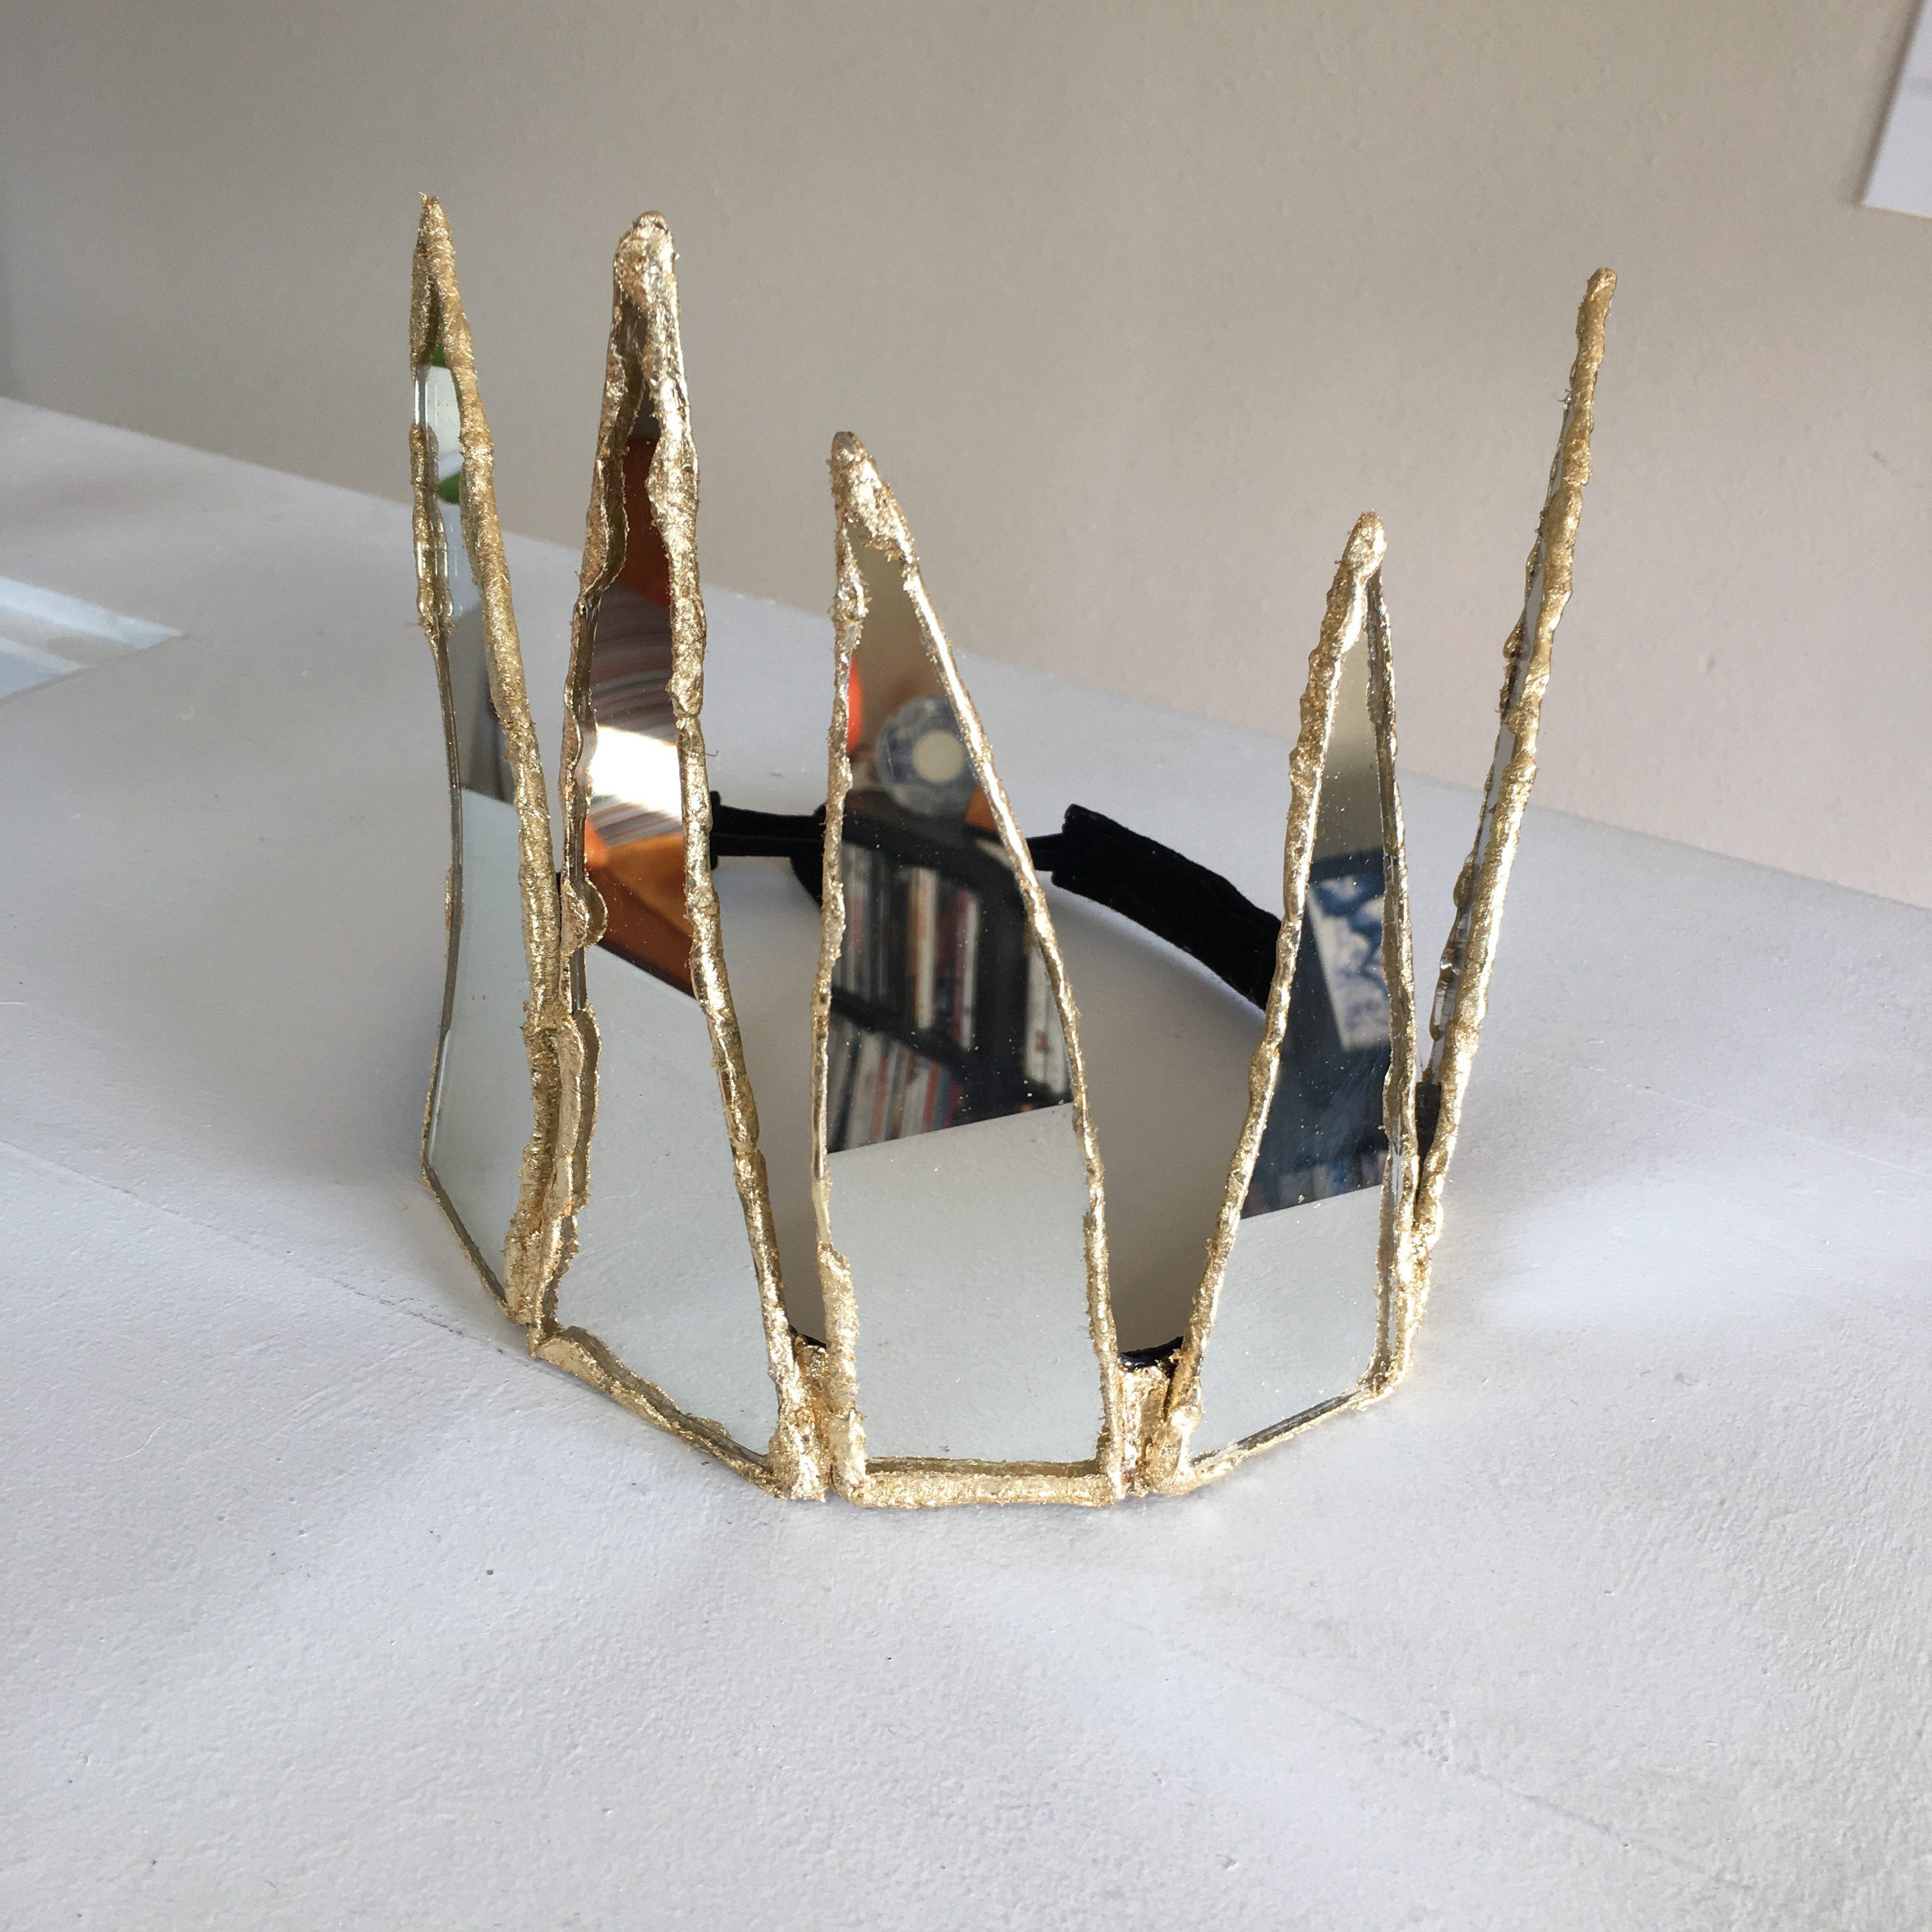 Eowyn Elleveve - The Evil Queen's Crown